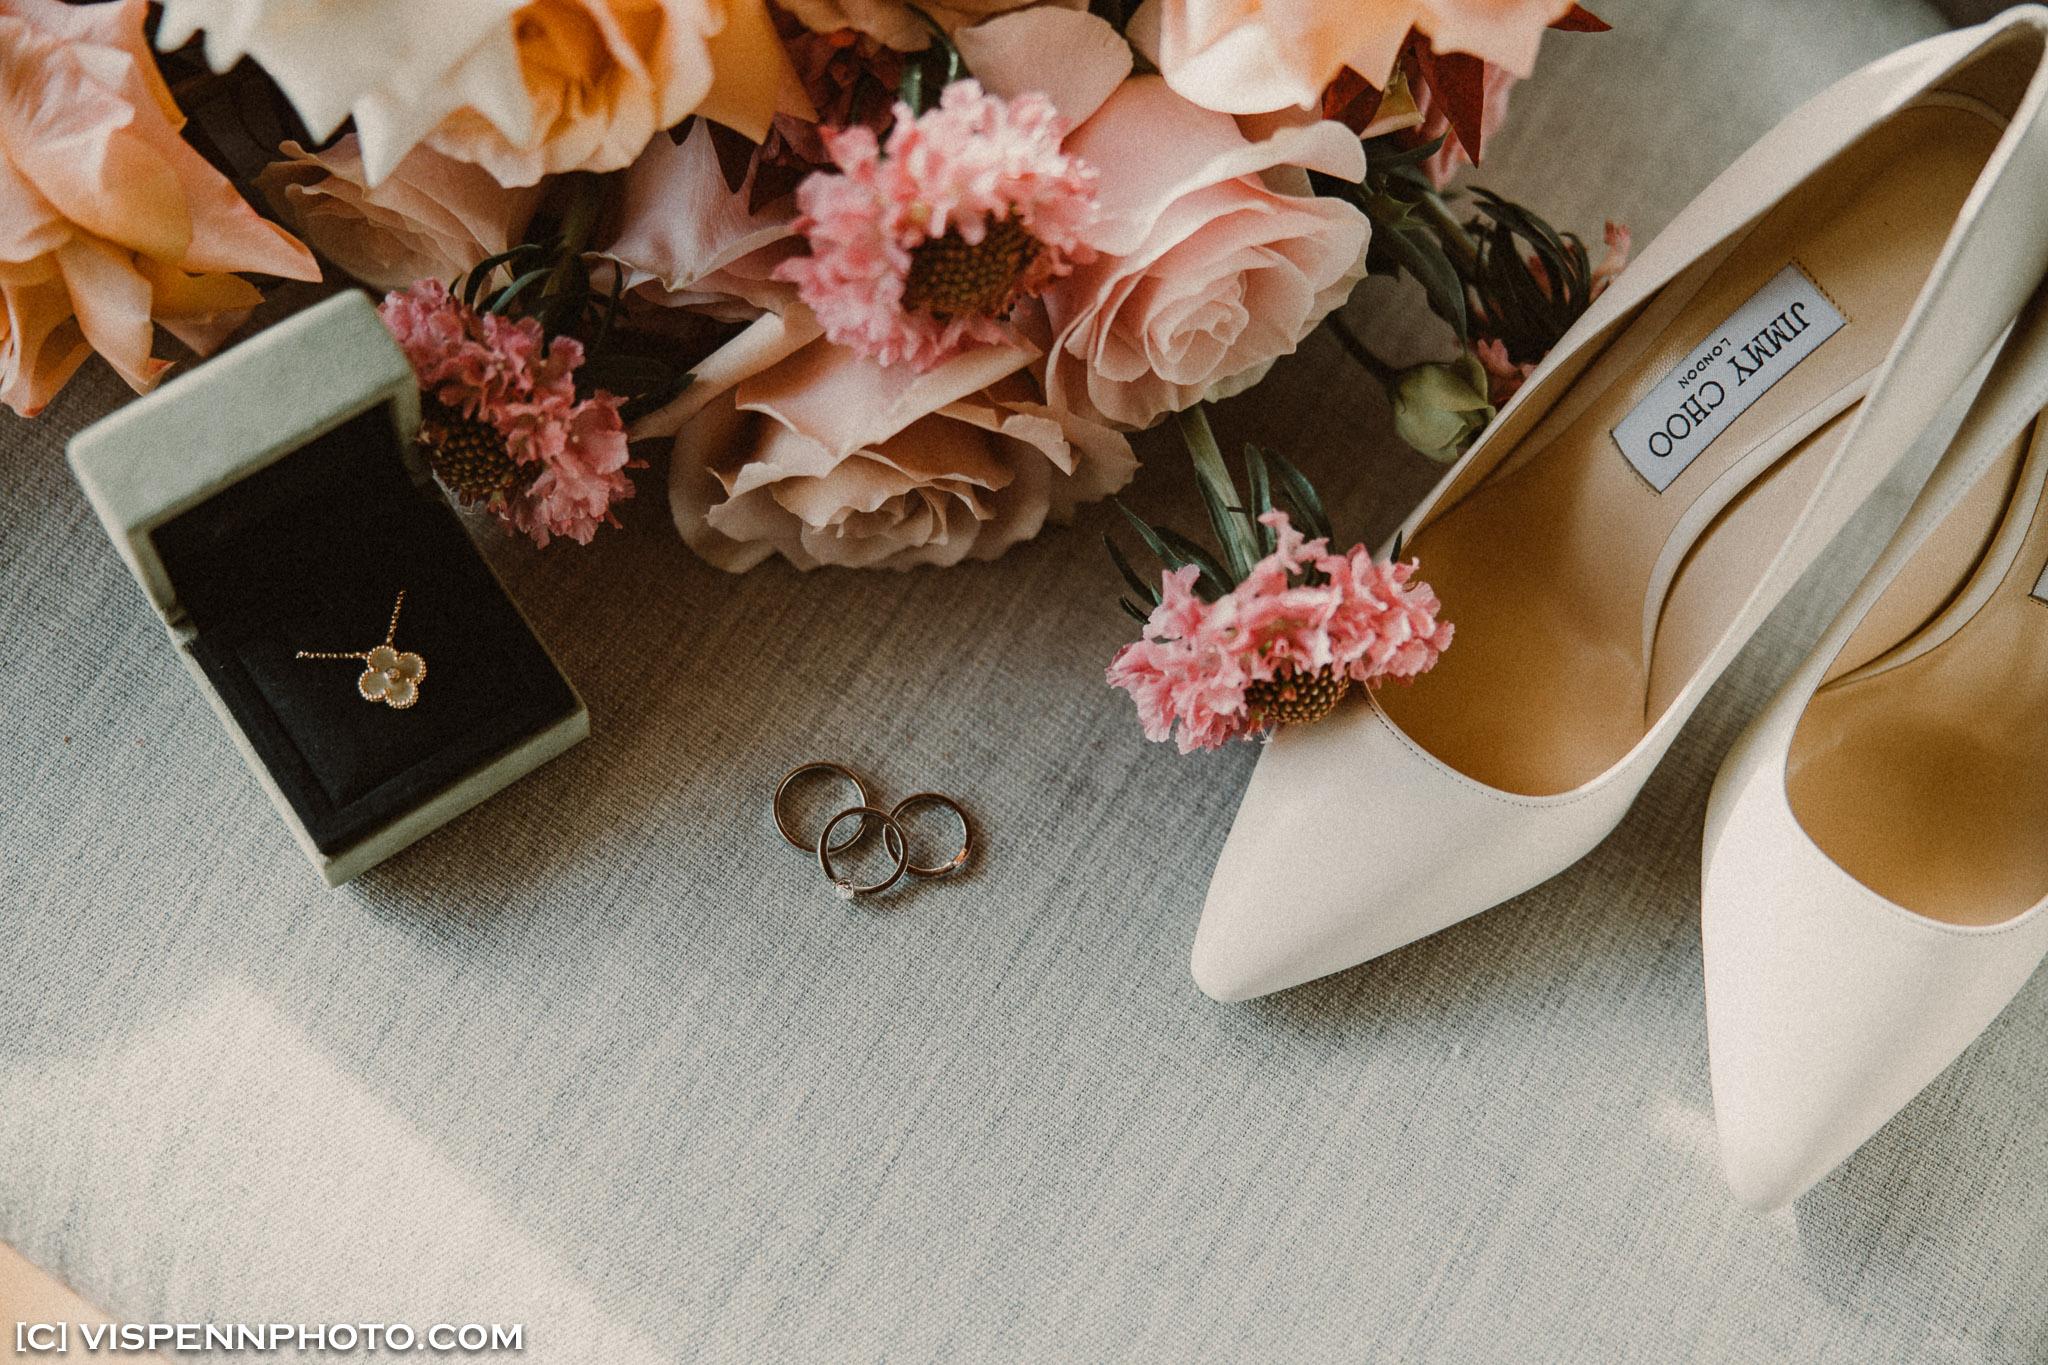 WEDDING DAY Photography Melbourne VISPENN 墨尔本 婚礼跟拍 婚礼摄像 婚礼摄影 结婚照 登记照 DominicHelen 1P 1473 EOSR VISPENN